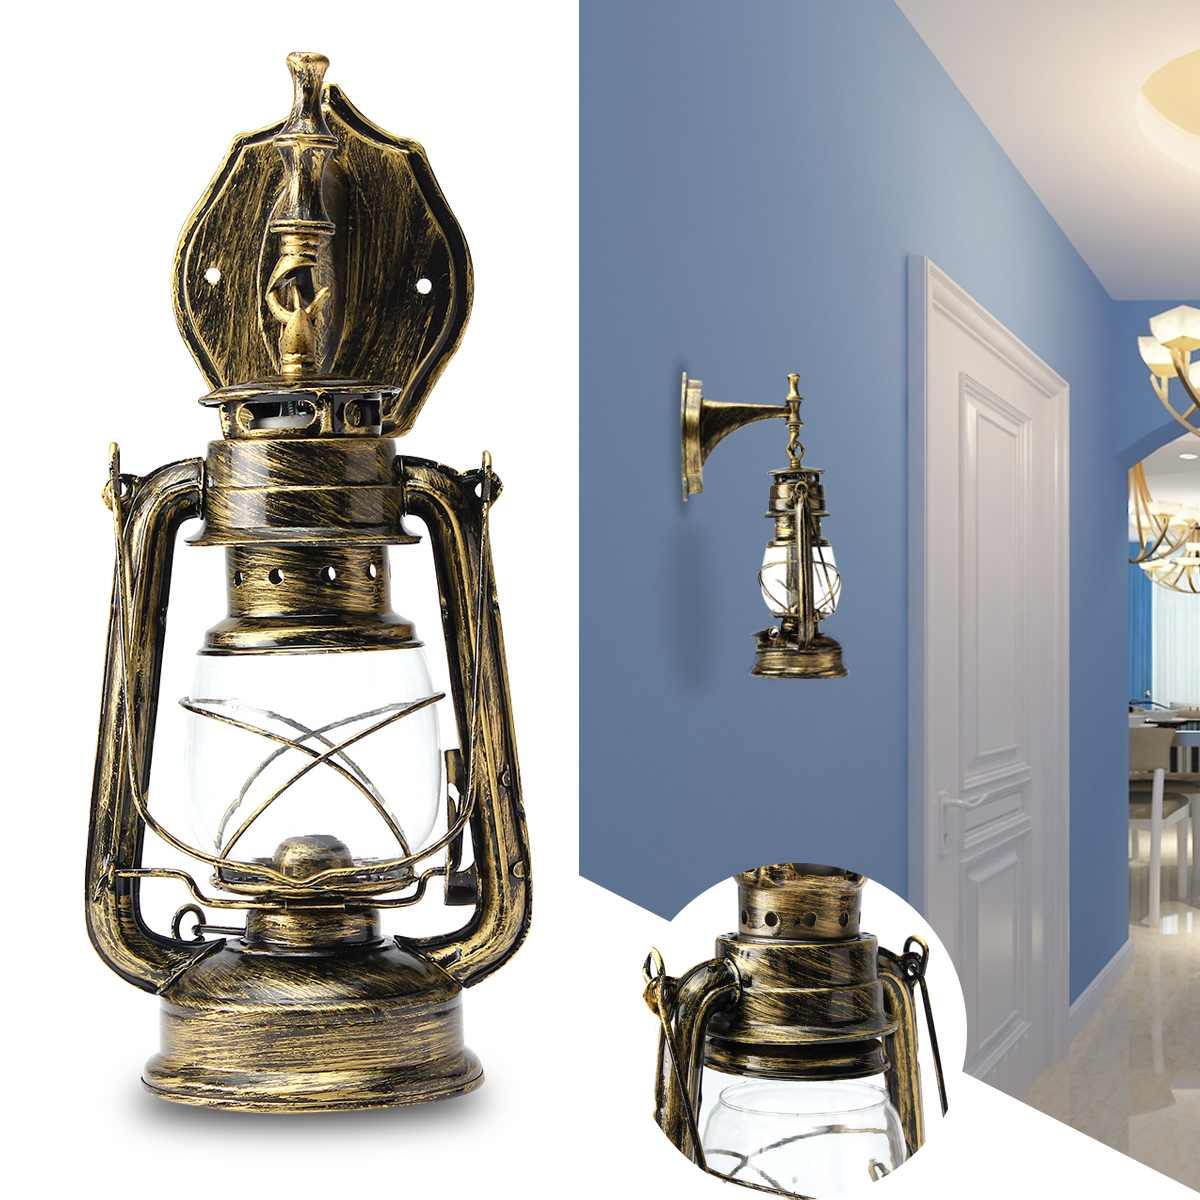 lamp antique industrial e27 bedroom colors hanging classic children male down pendant cap